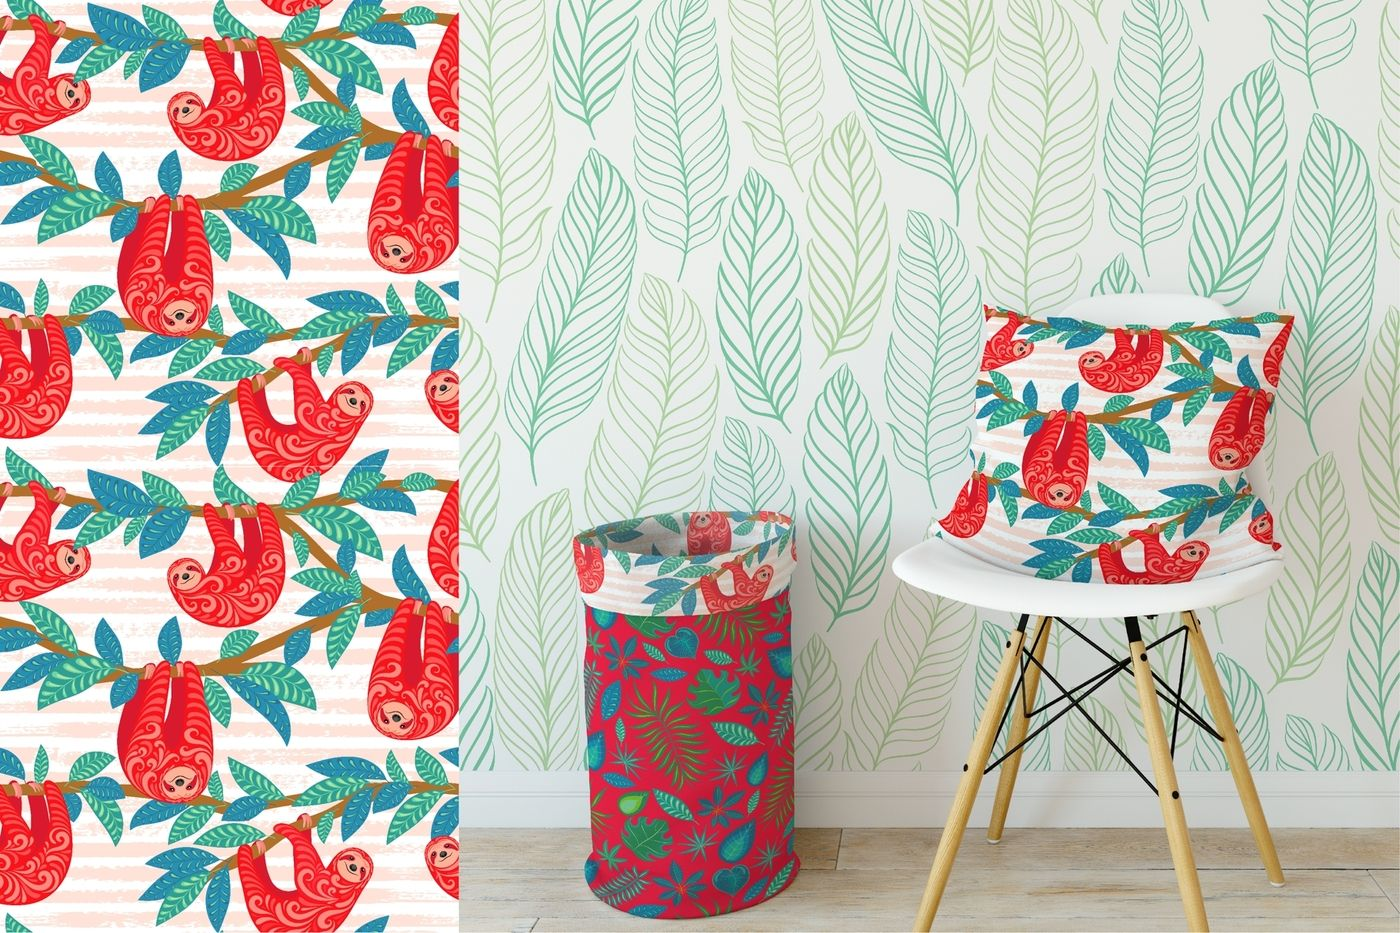 Tropicana 30 Seamless Patterns By Irina Skaska Thehungryjpeg Com